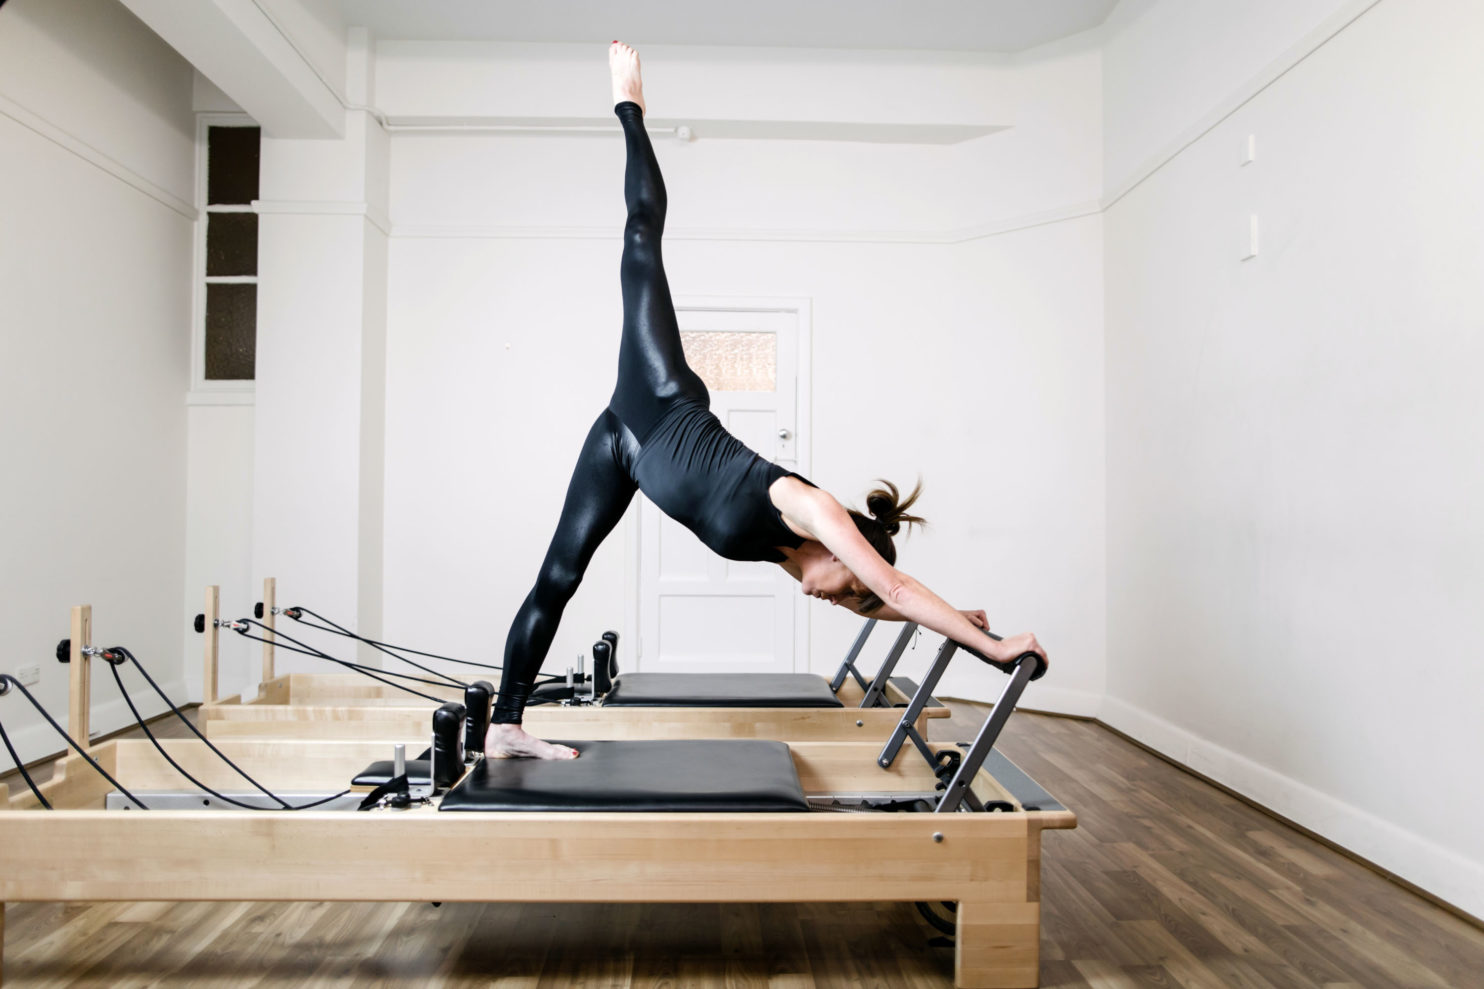 Pilates-on-Collins-Gareth-Sobey-Photography-Hi-Res-129-1484x989.jpg